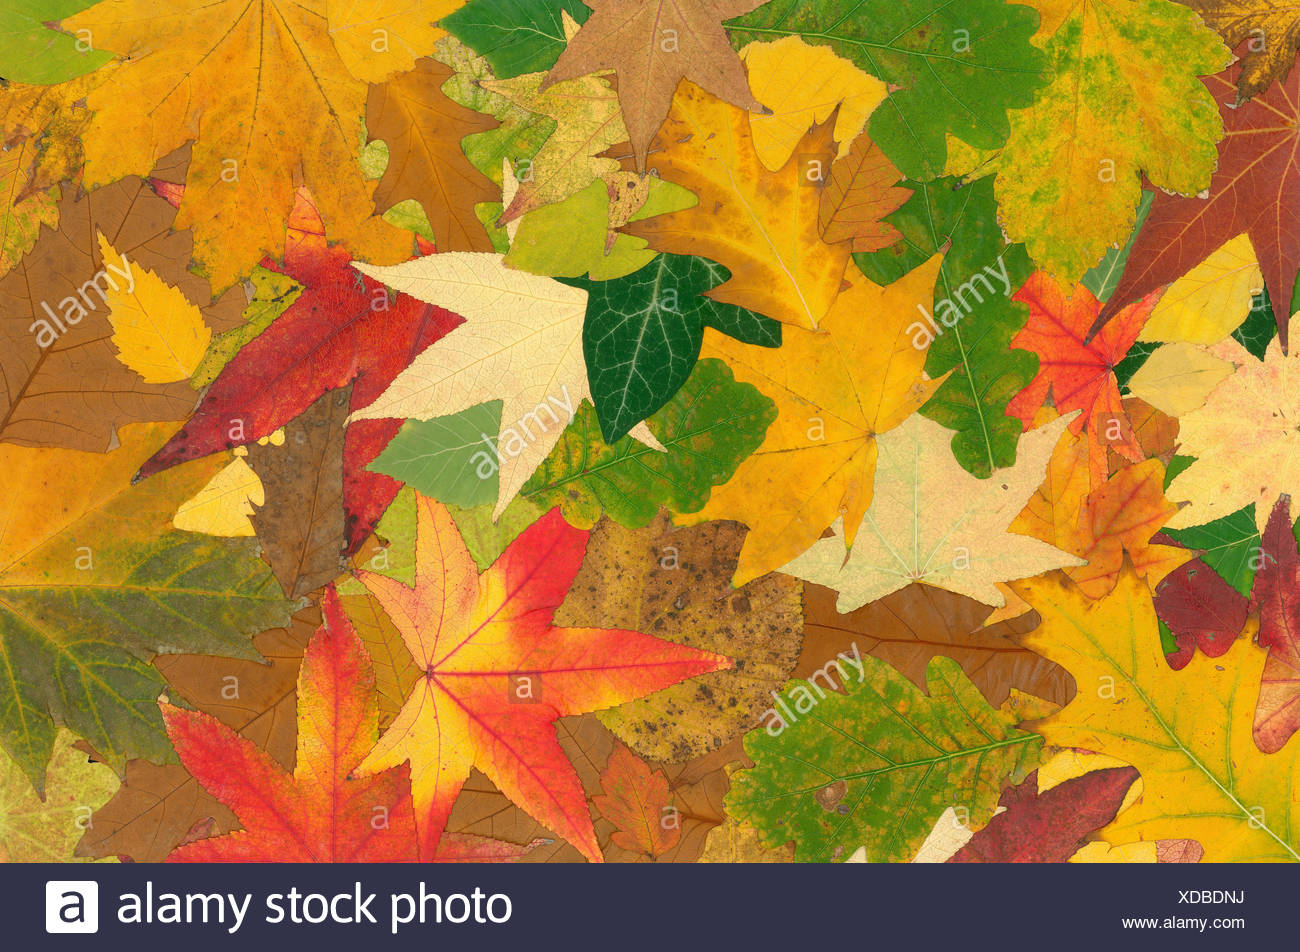 Maple Leaf Wallpaper Estacional Follaje Deja Caer La Textura